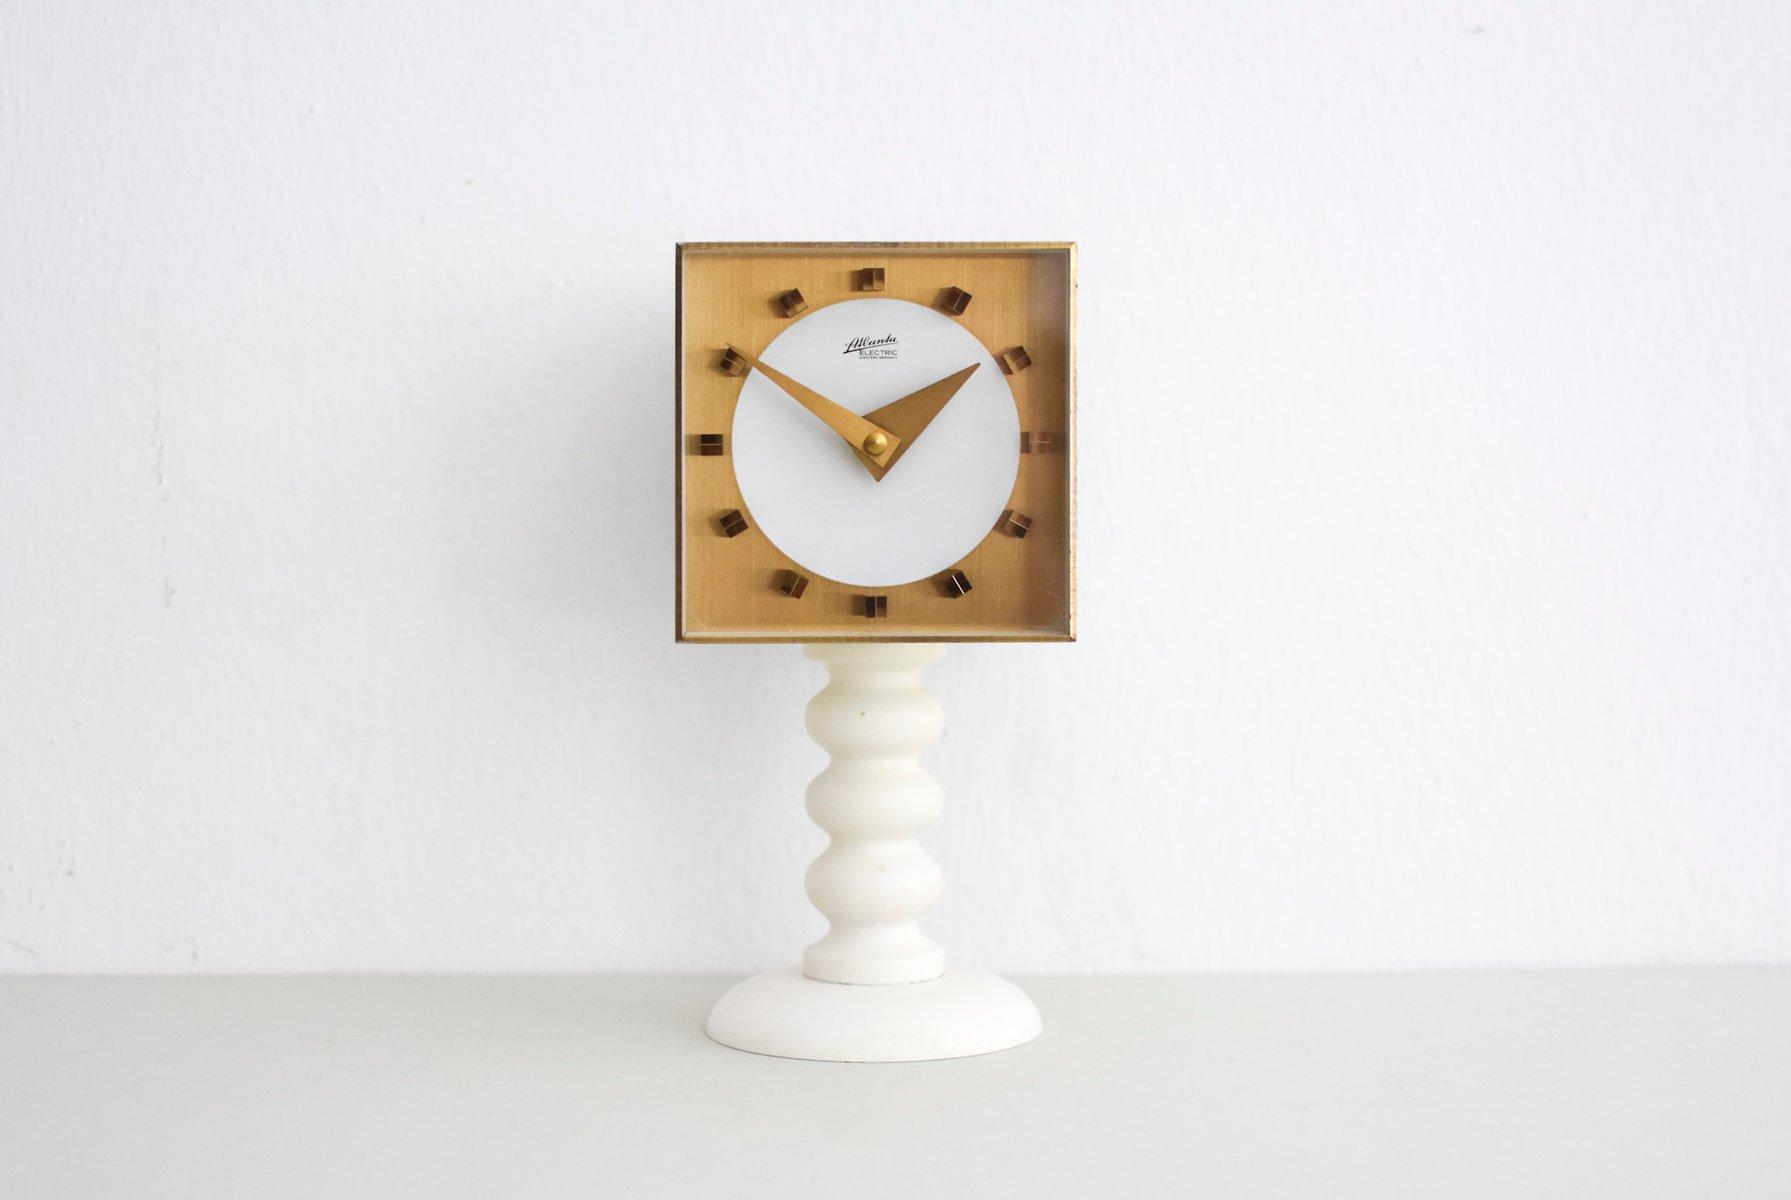 home image writing black garden desk clock newgate clocks